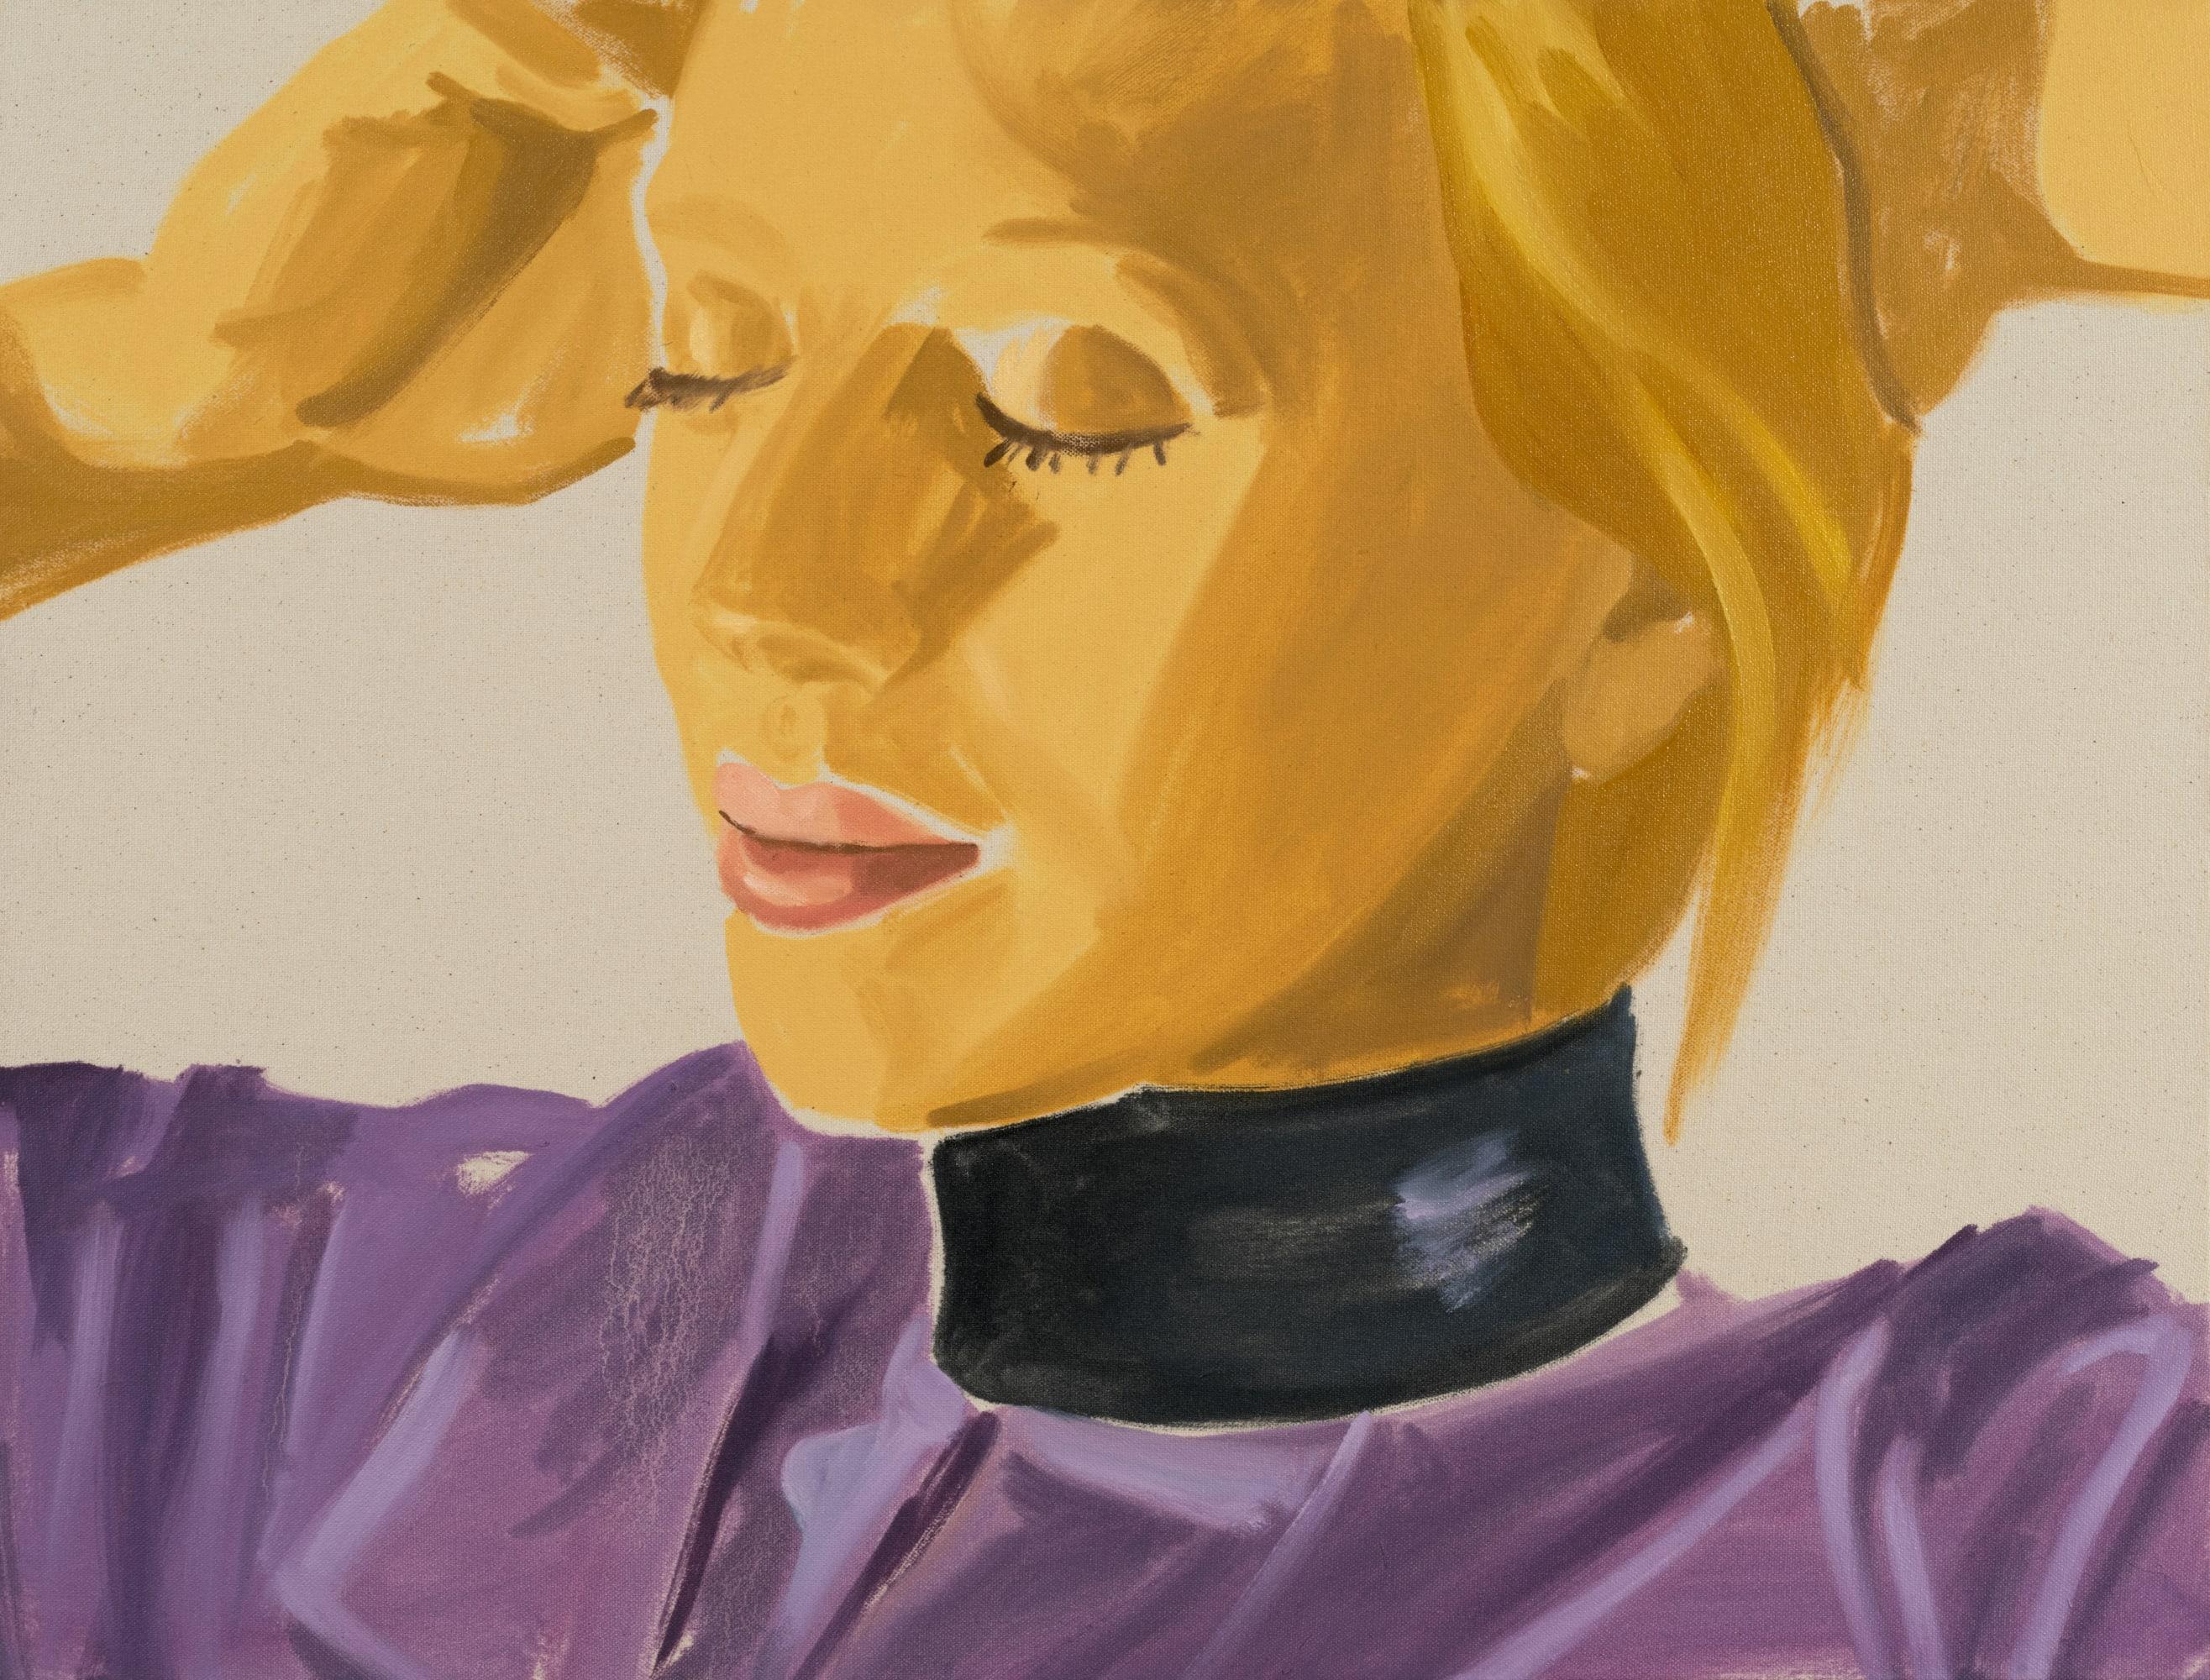 David Salle, Lili 3 (2019); Self-Ironing Pants & Other Paintings at Thaddaeus Ropac Paris Marais 2020